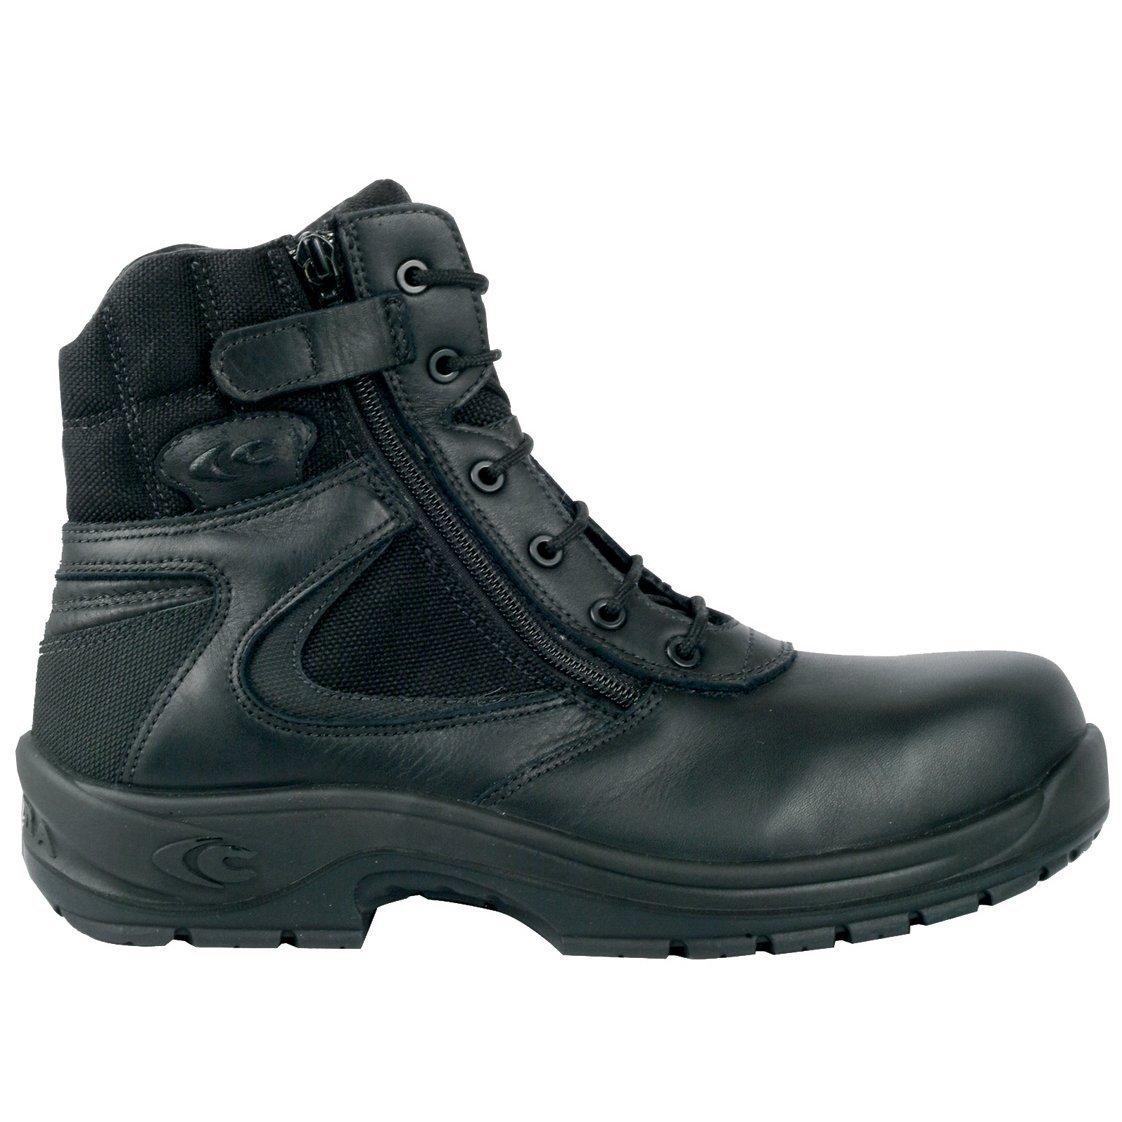 10260-000 /000/Negro Cofra/ /Botas de seguridad Police S3/HRO SRC superior Top 10260/